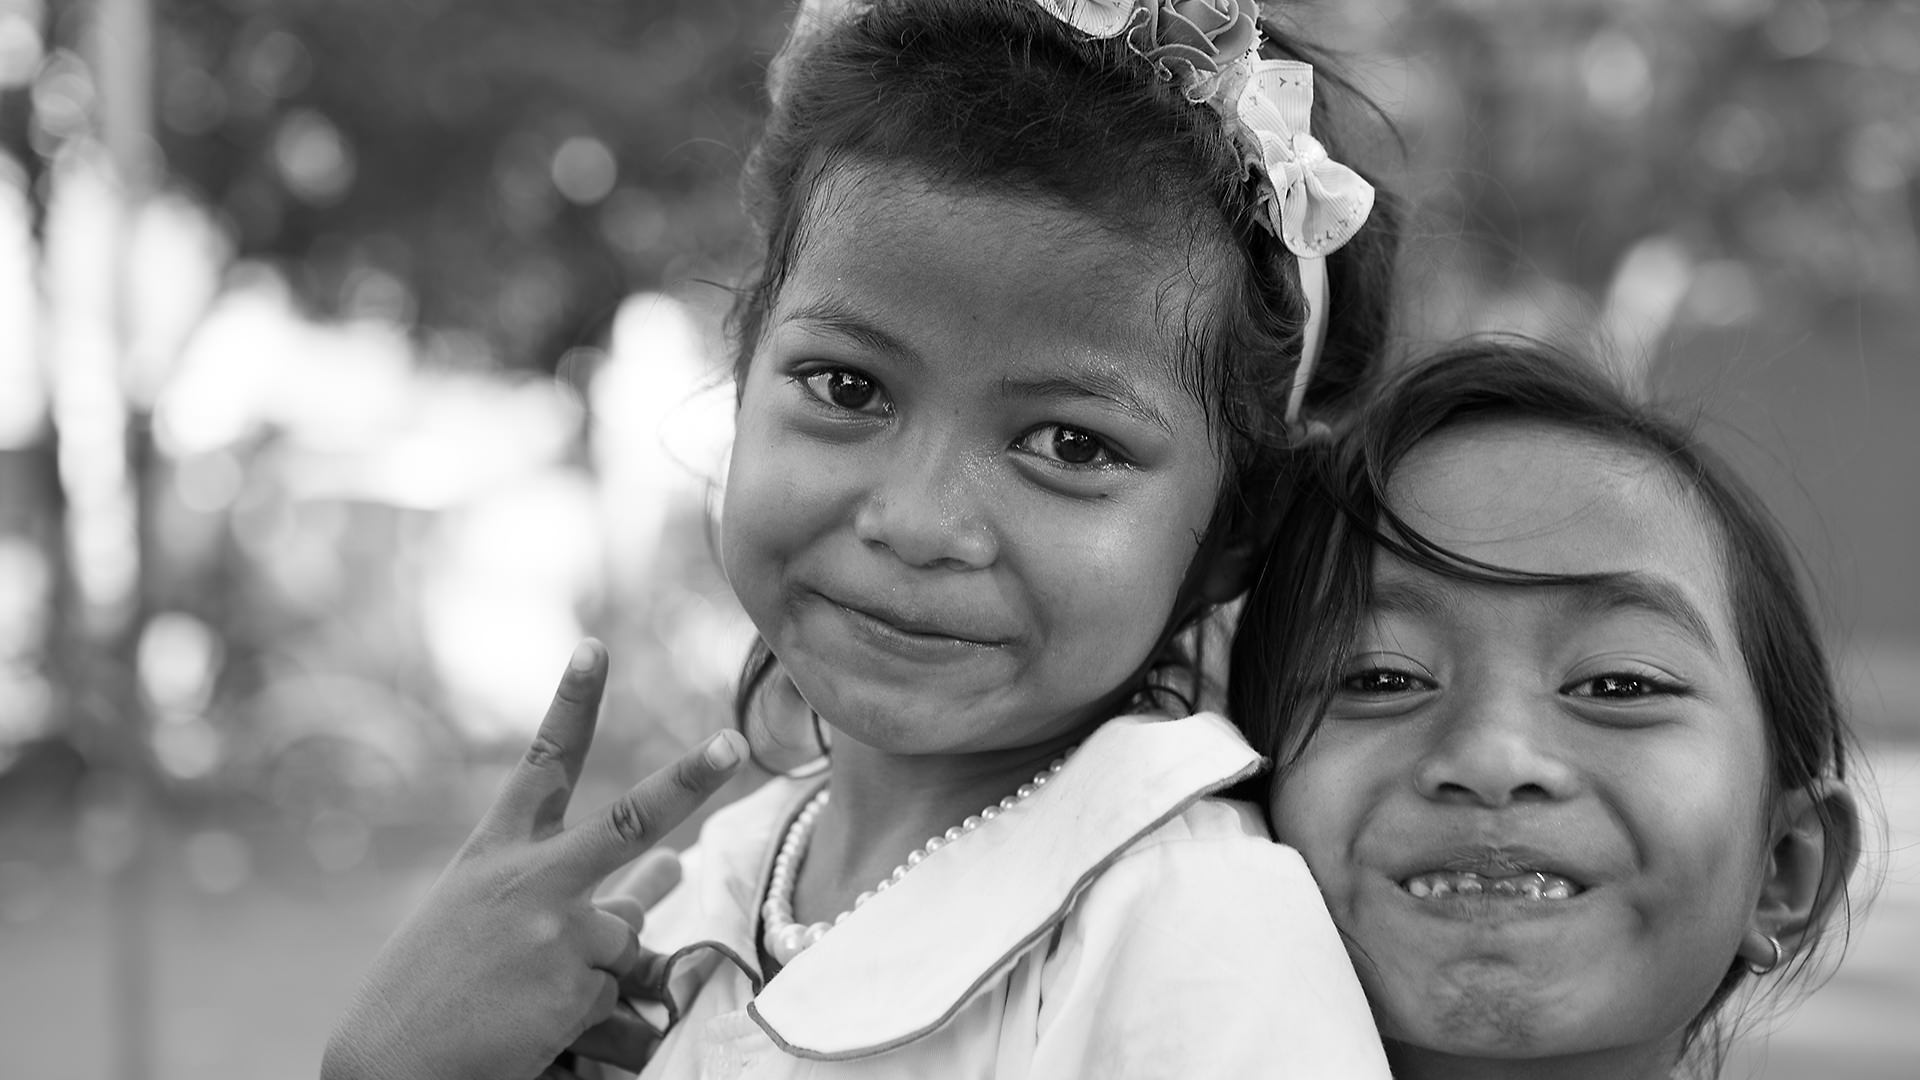 Cambodia - fot. Tomasz Stolz